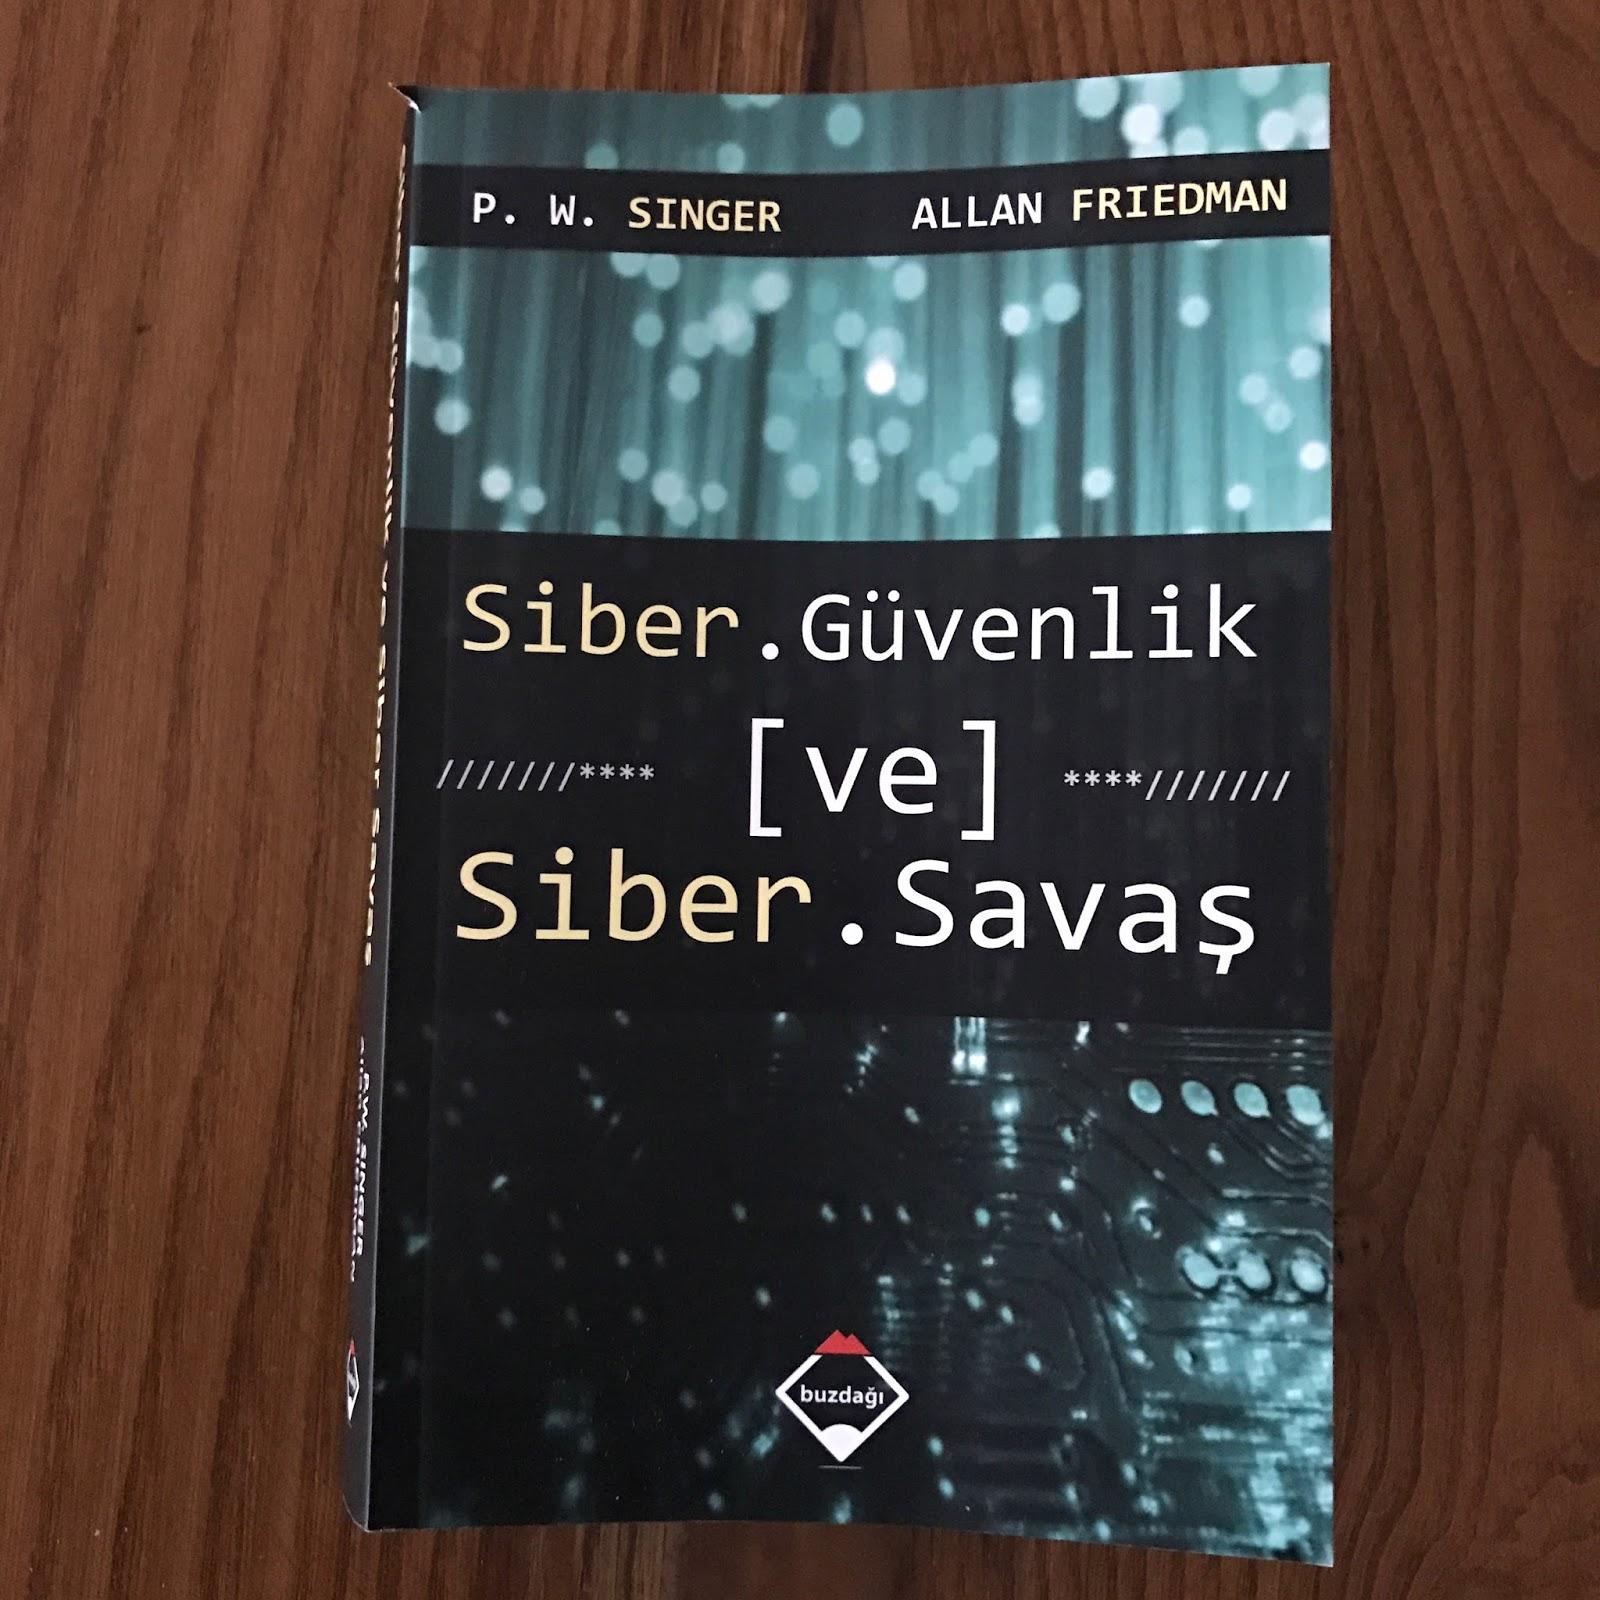 Siber Guvenlik ve Siber Savas